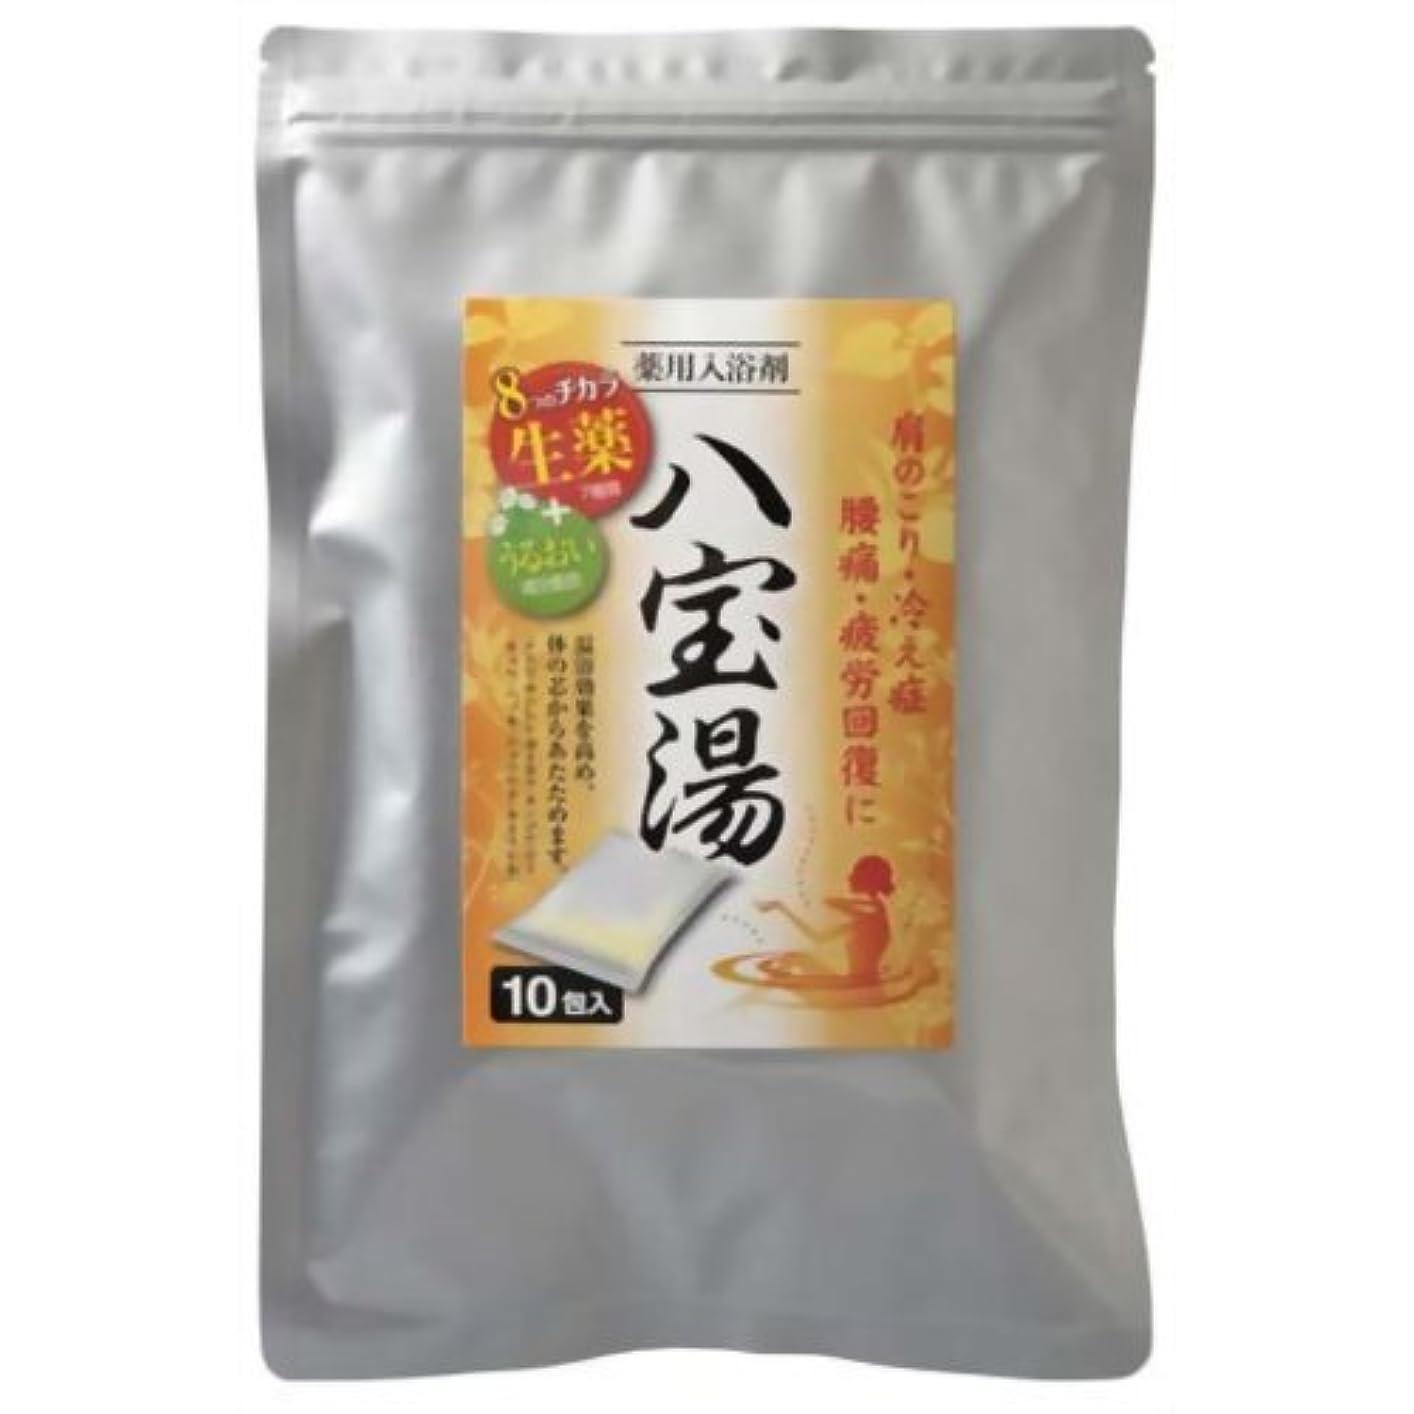 生産的鷹代表薬用入浴剤 八宝湯 カモミールの香り 10包 [医薬部外品]